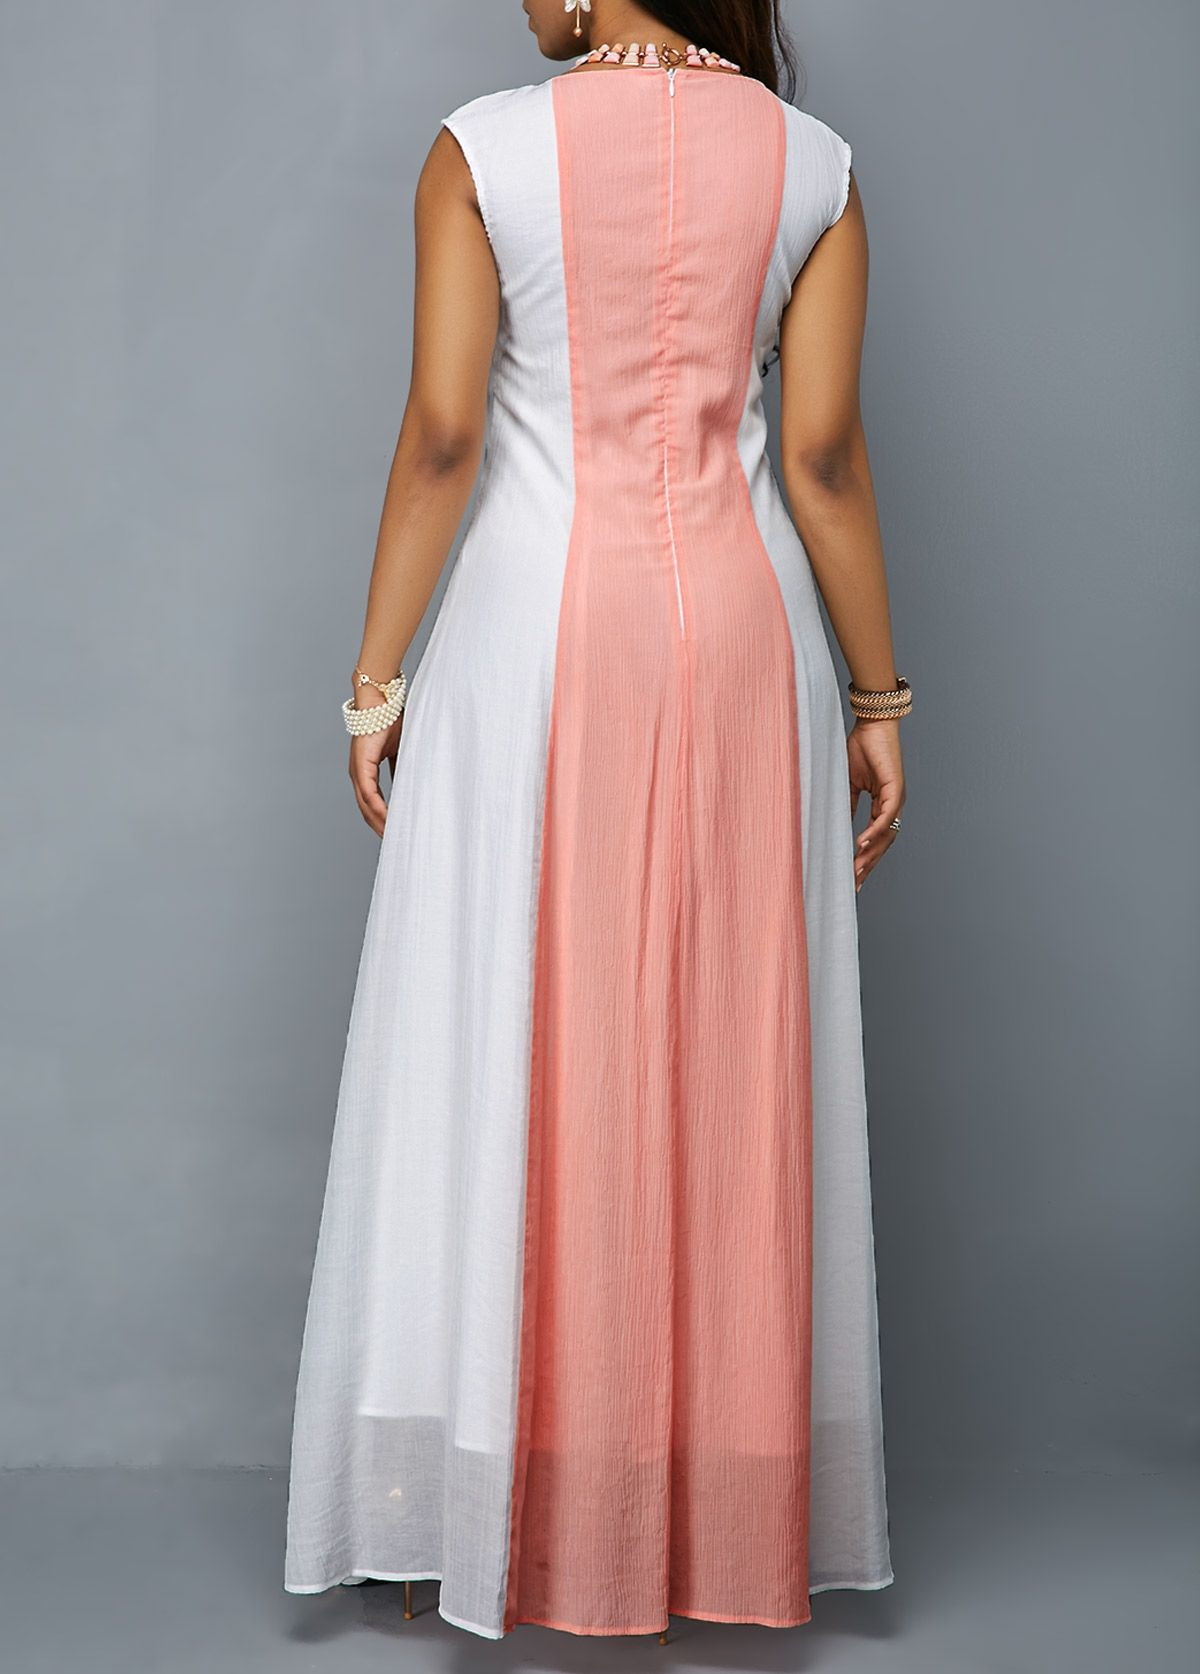 Sleeveless Zipper Back Round Neck Maxi Dress Rotita Com Usd 37 47 Long Summer Dresses Dresses Maxi Dress [ 1674 x 1200 Pixel ]